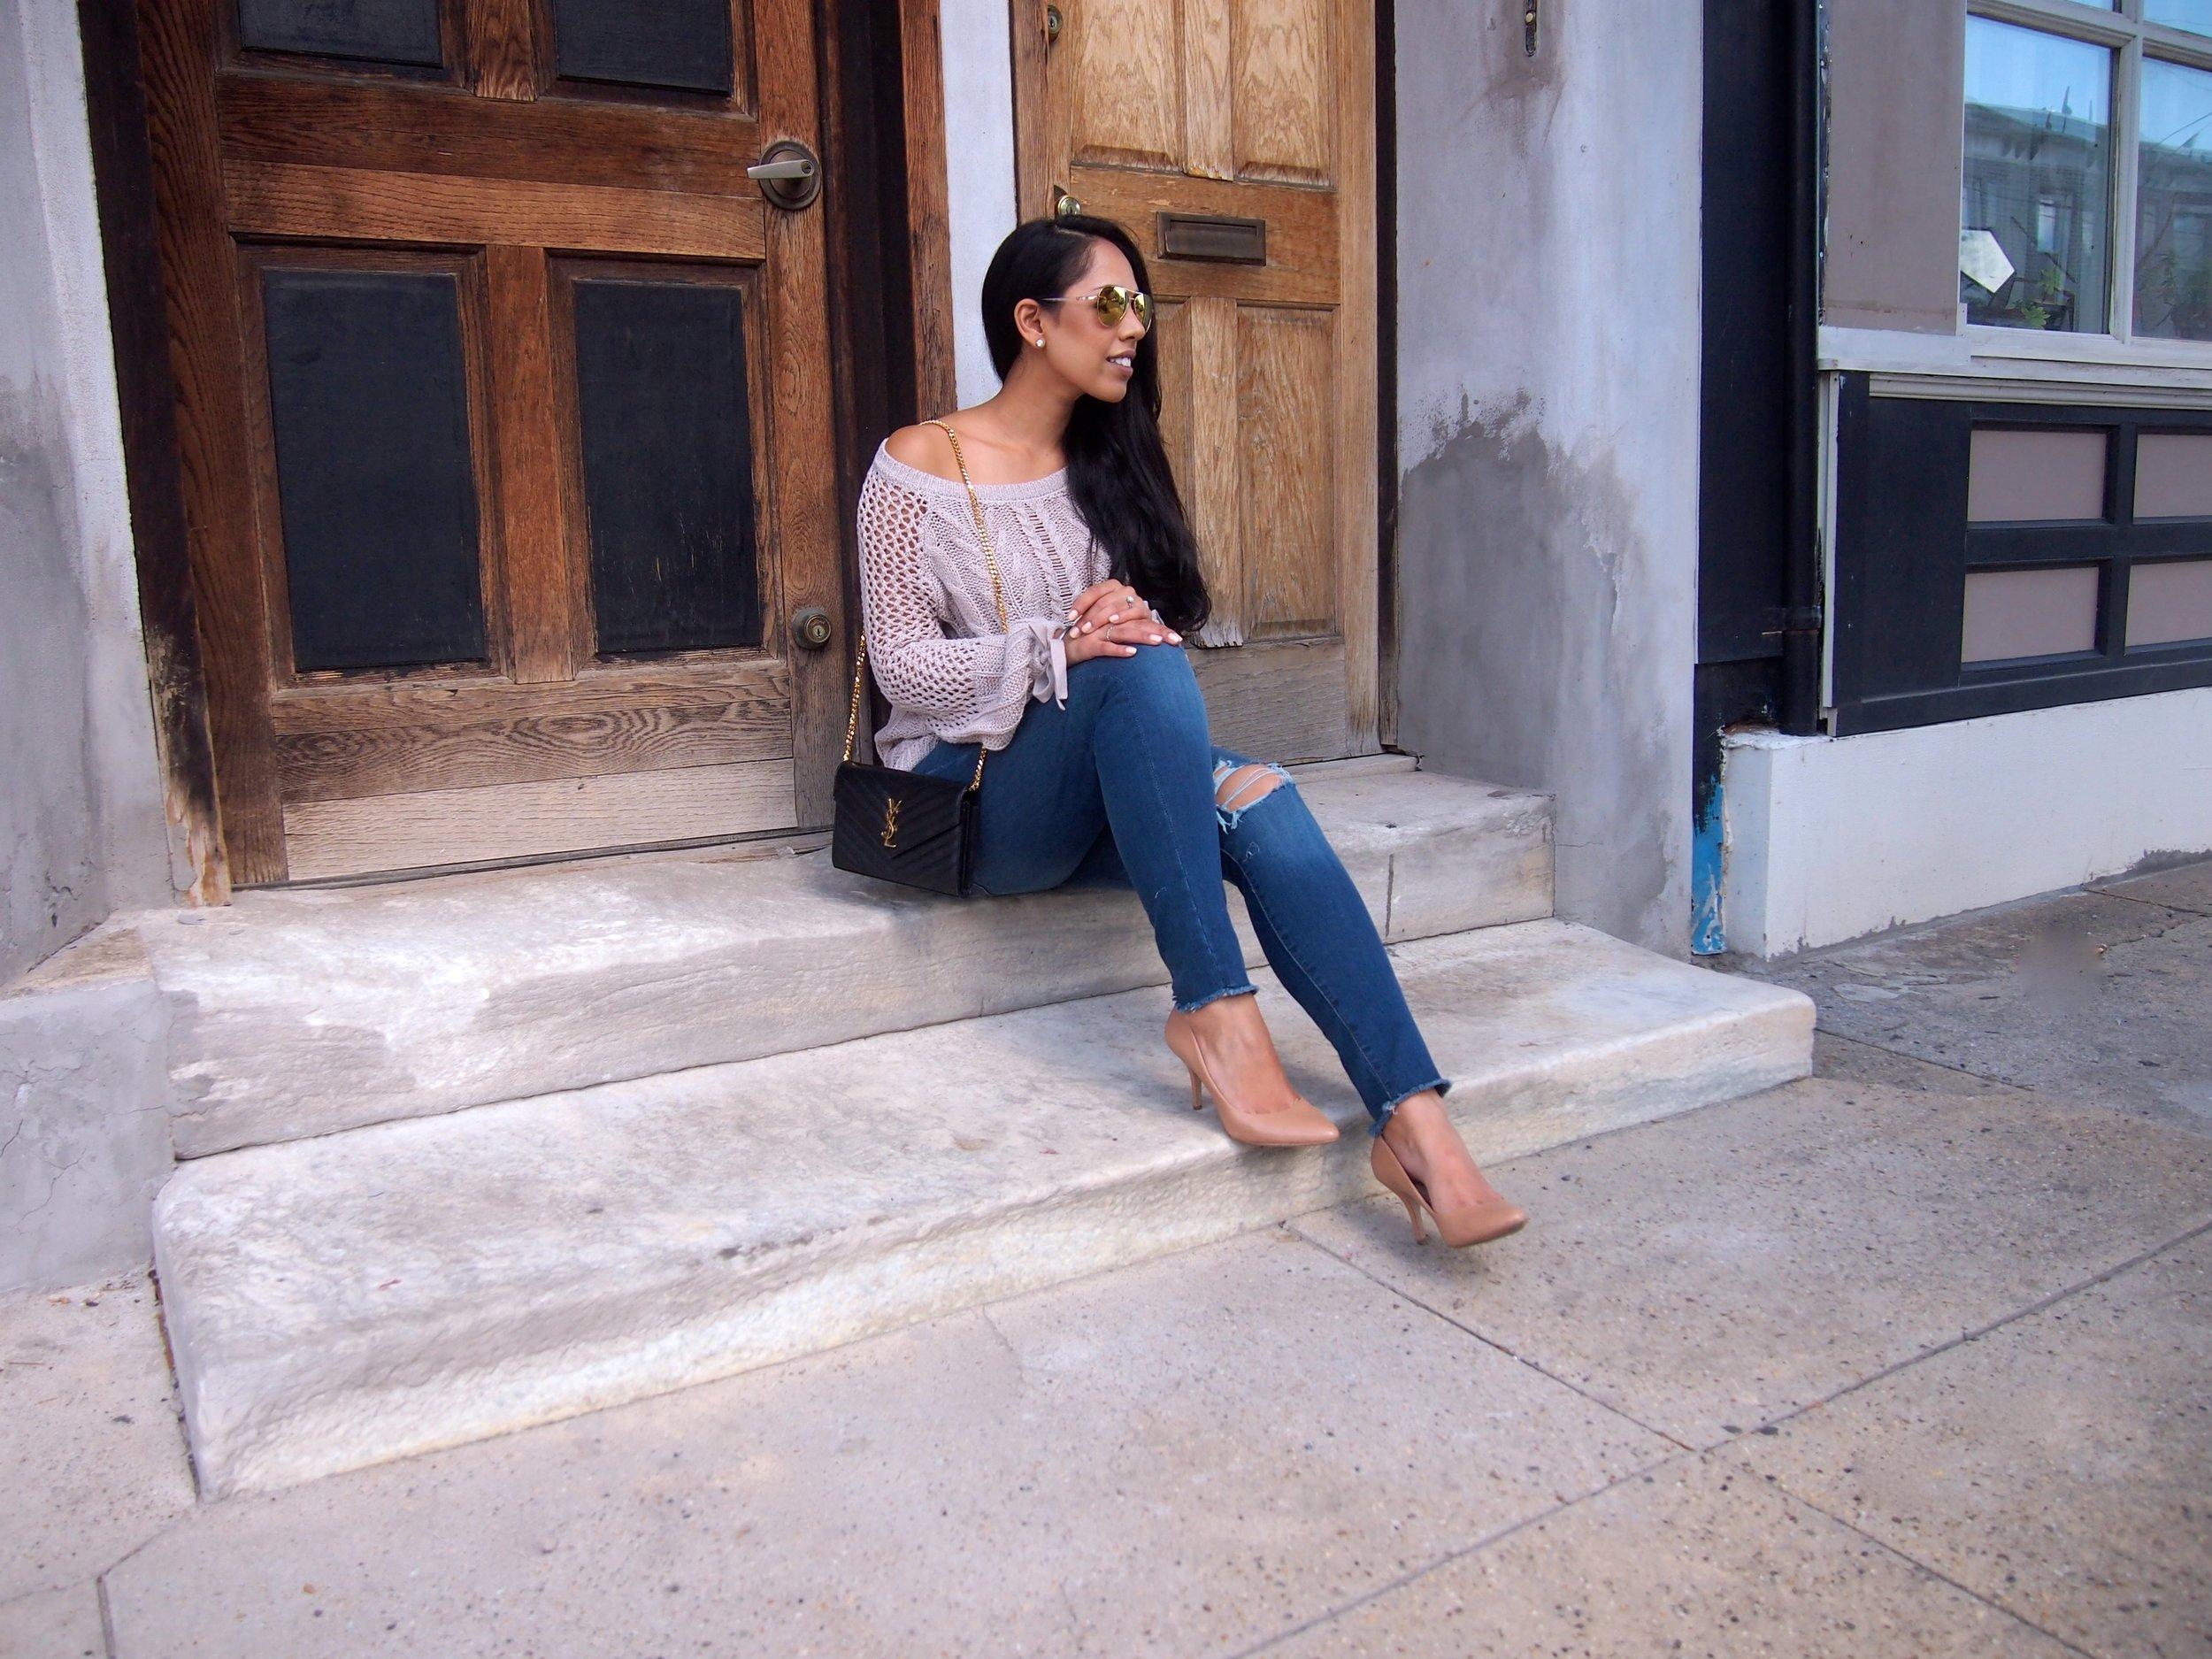 indian-phildelphia-fashion-blogger.JPG